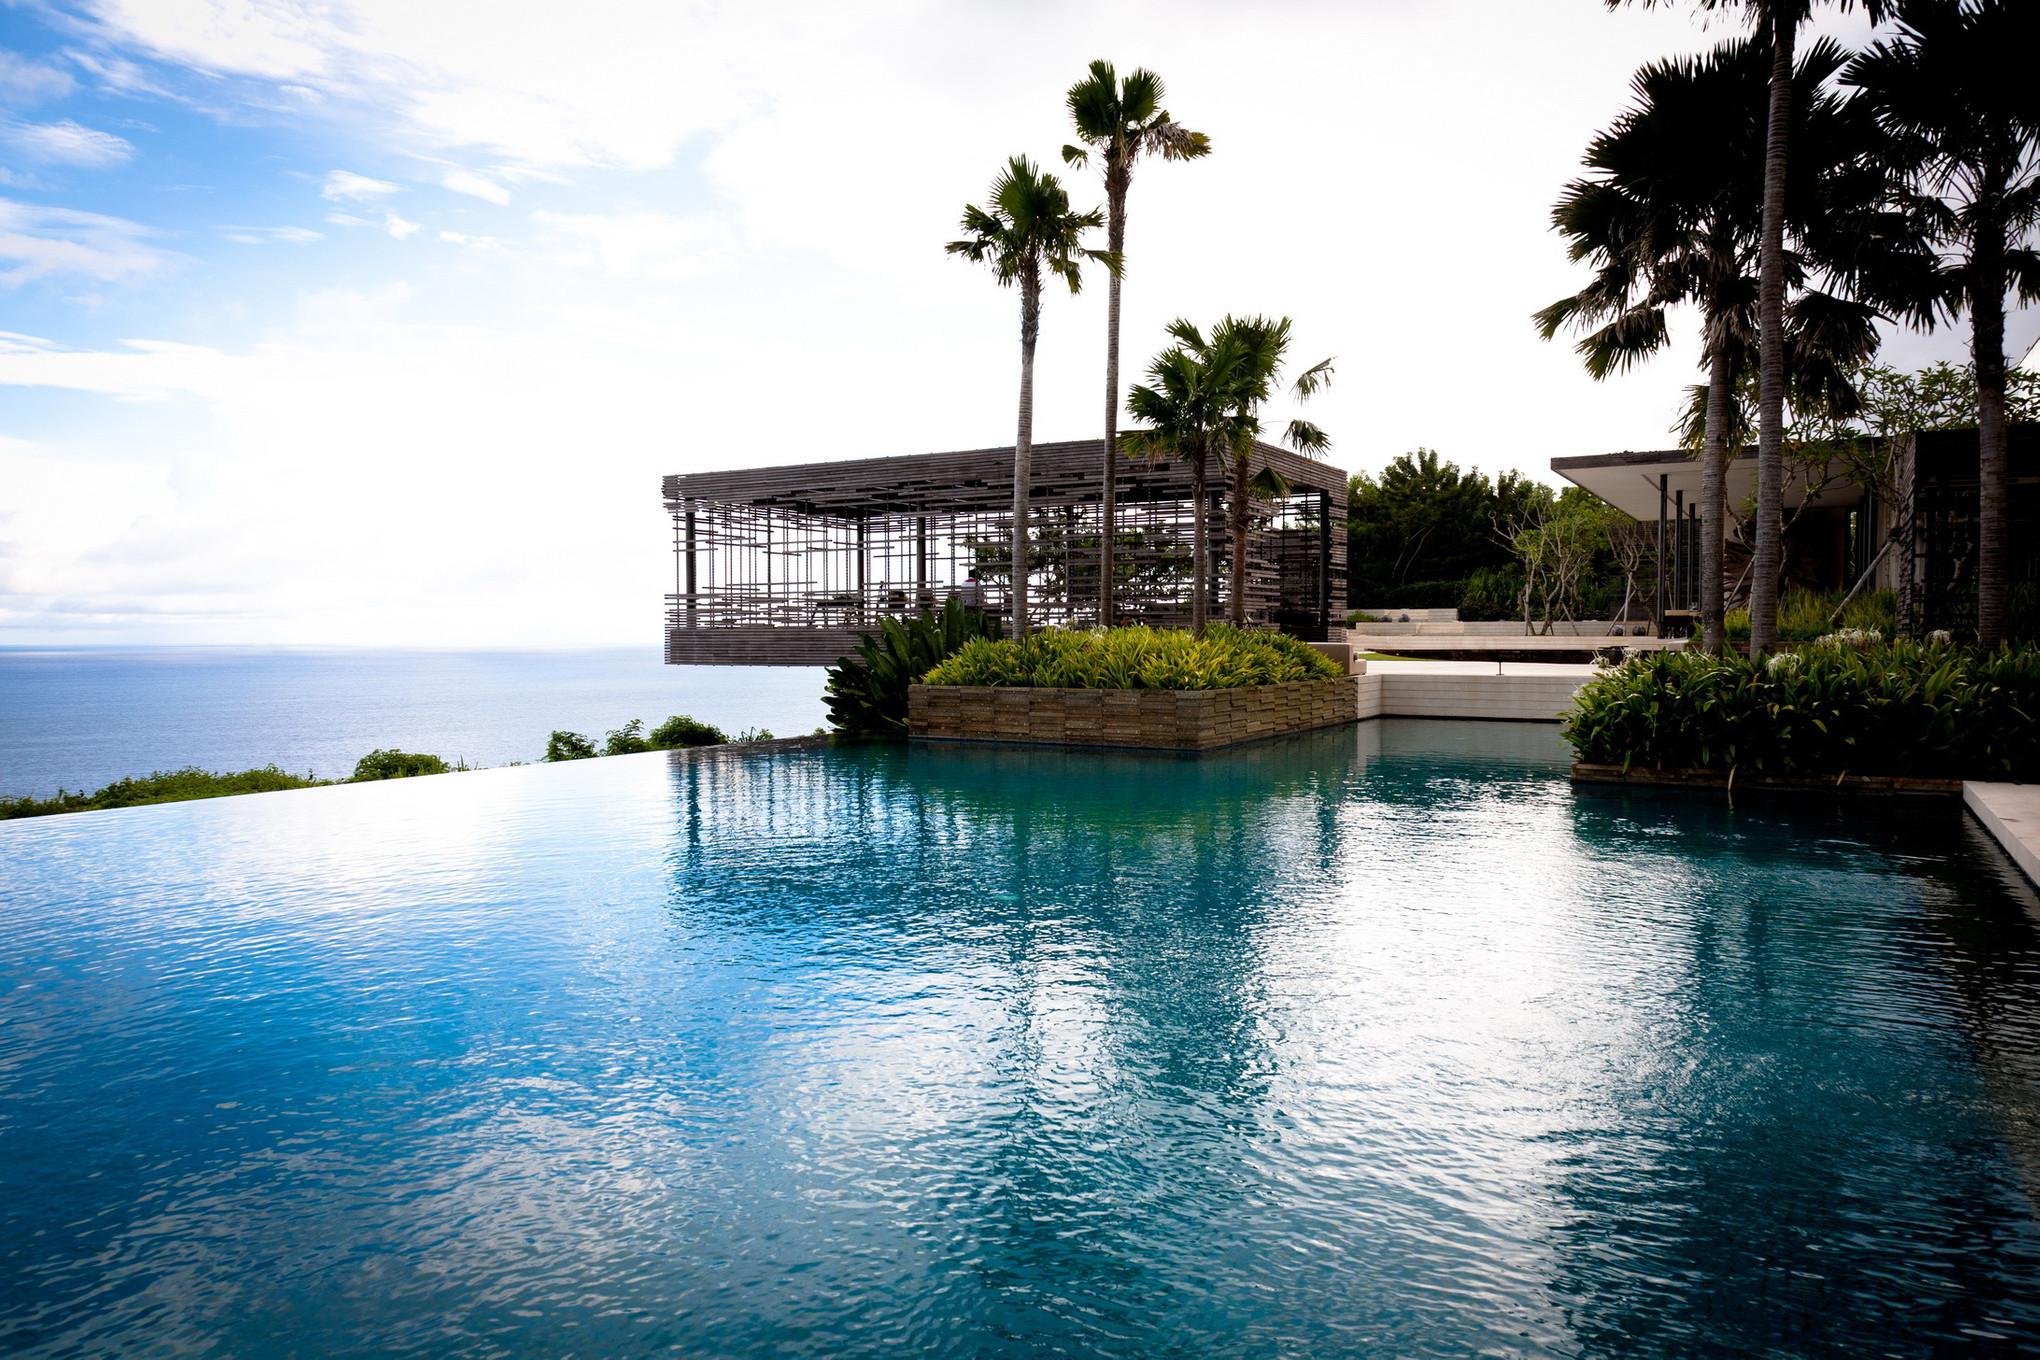 3 Amazing Tropical Destinations for Your Beach Honeymoon